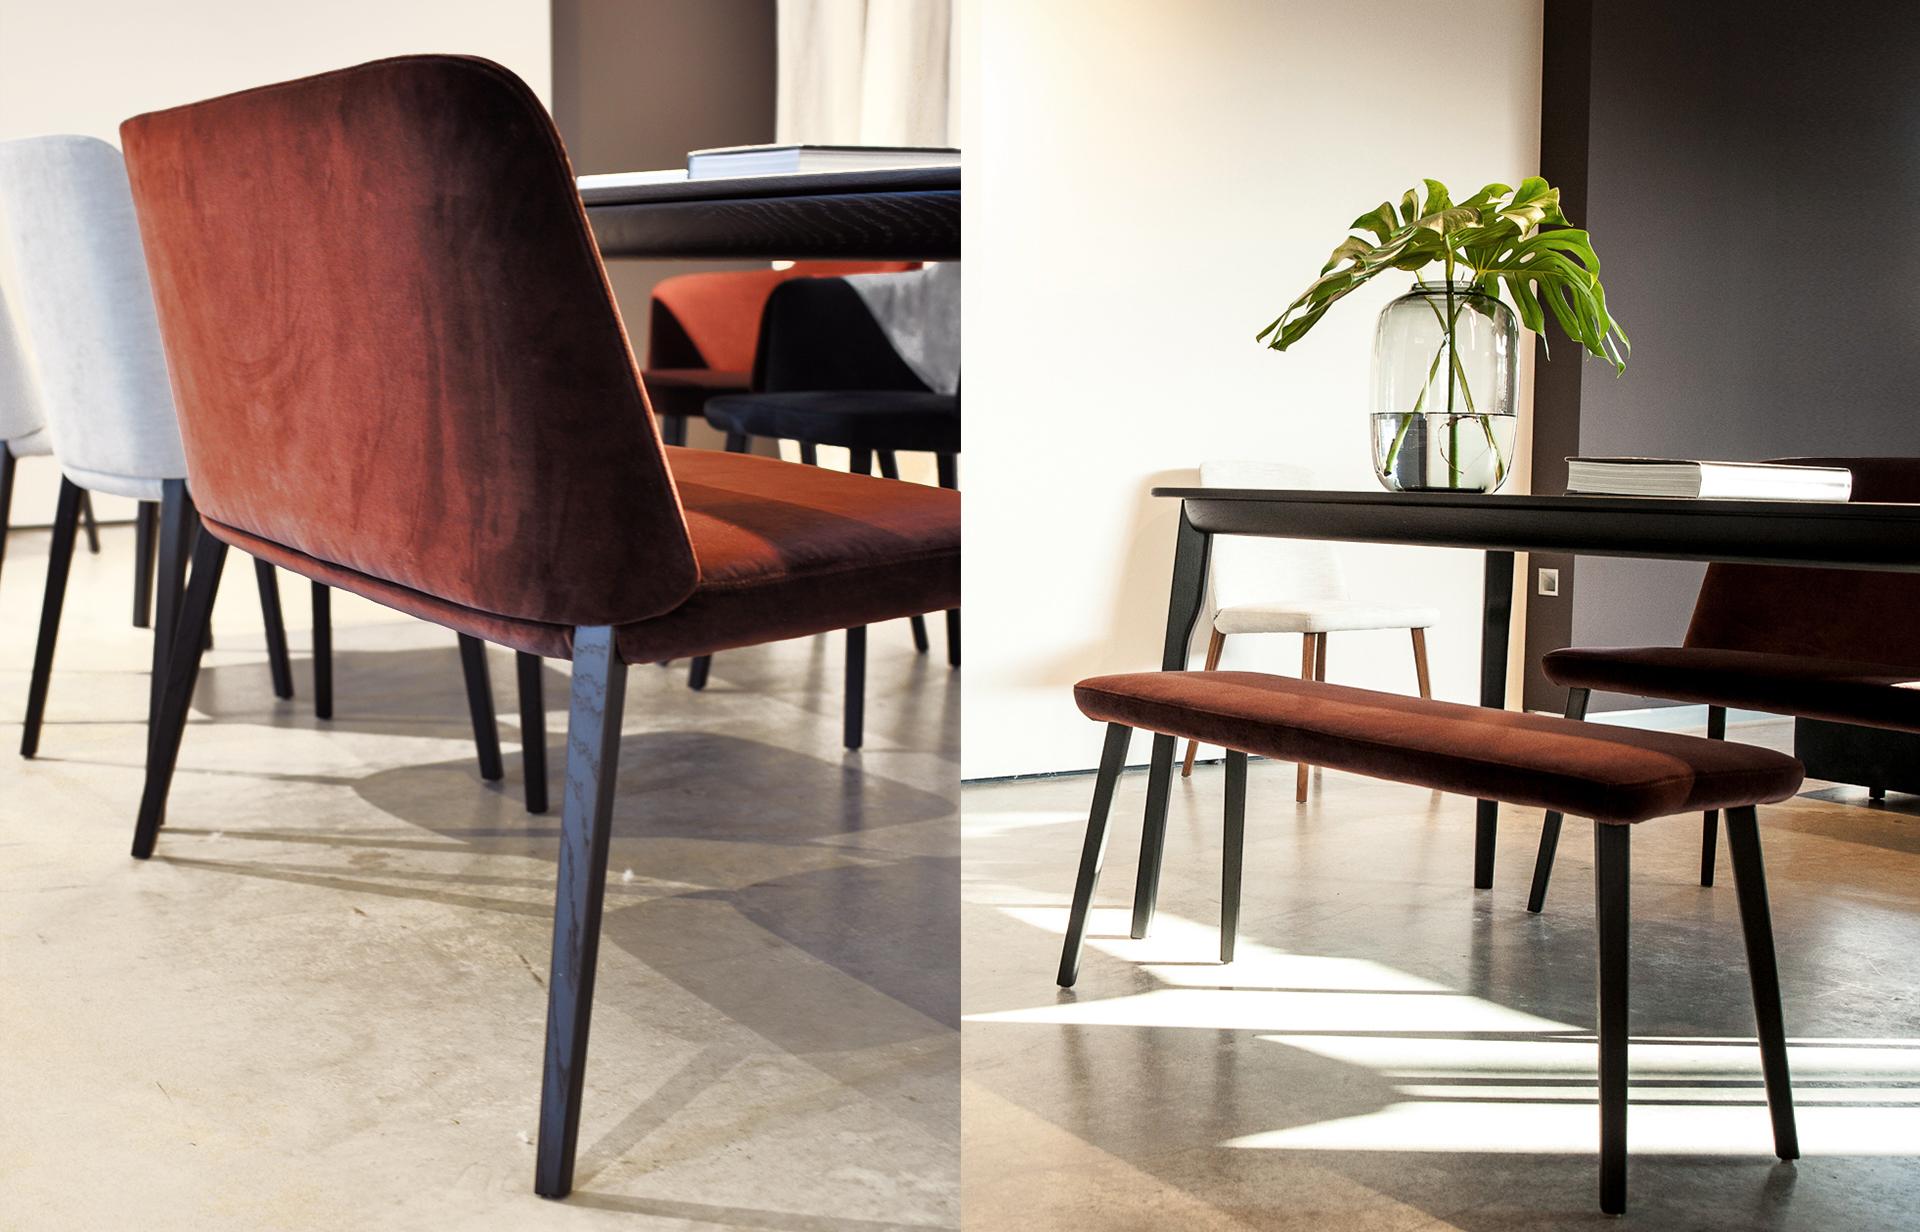 Design Bank Montis.Montis Impression Imm Cologne 2018